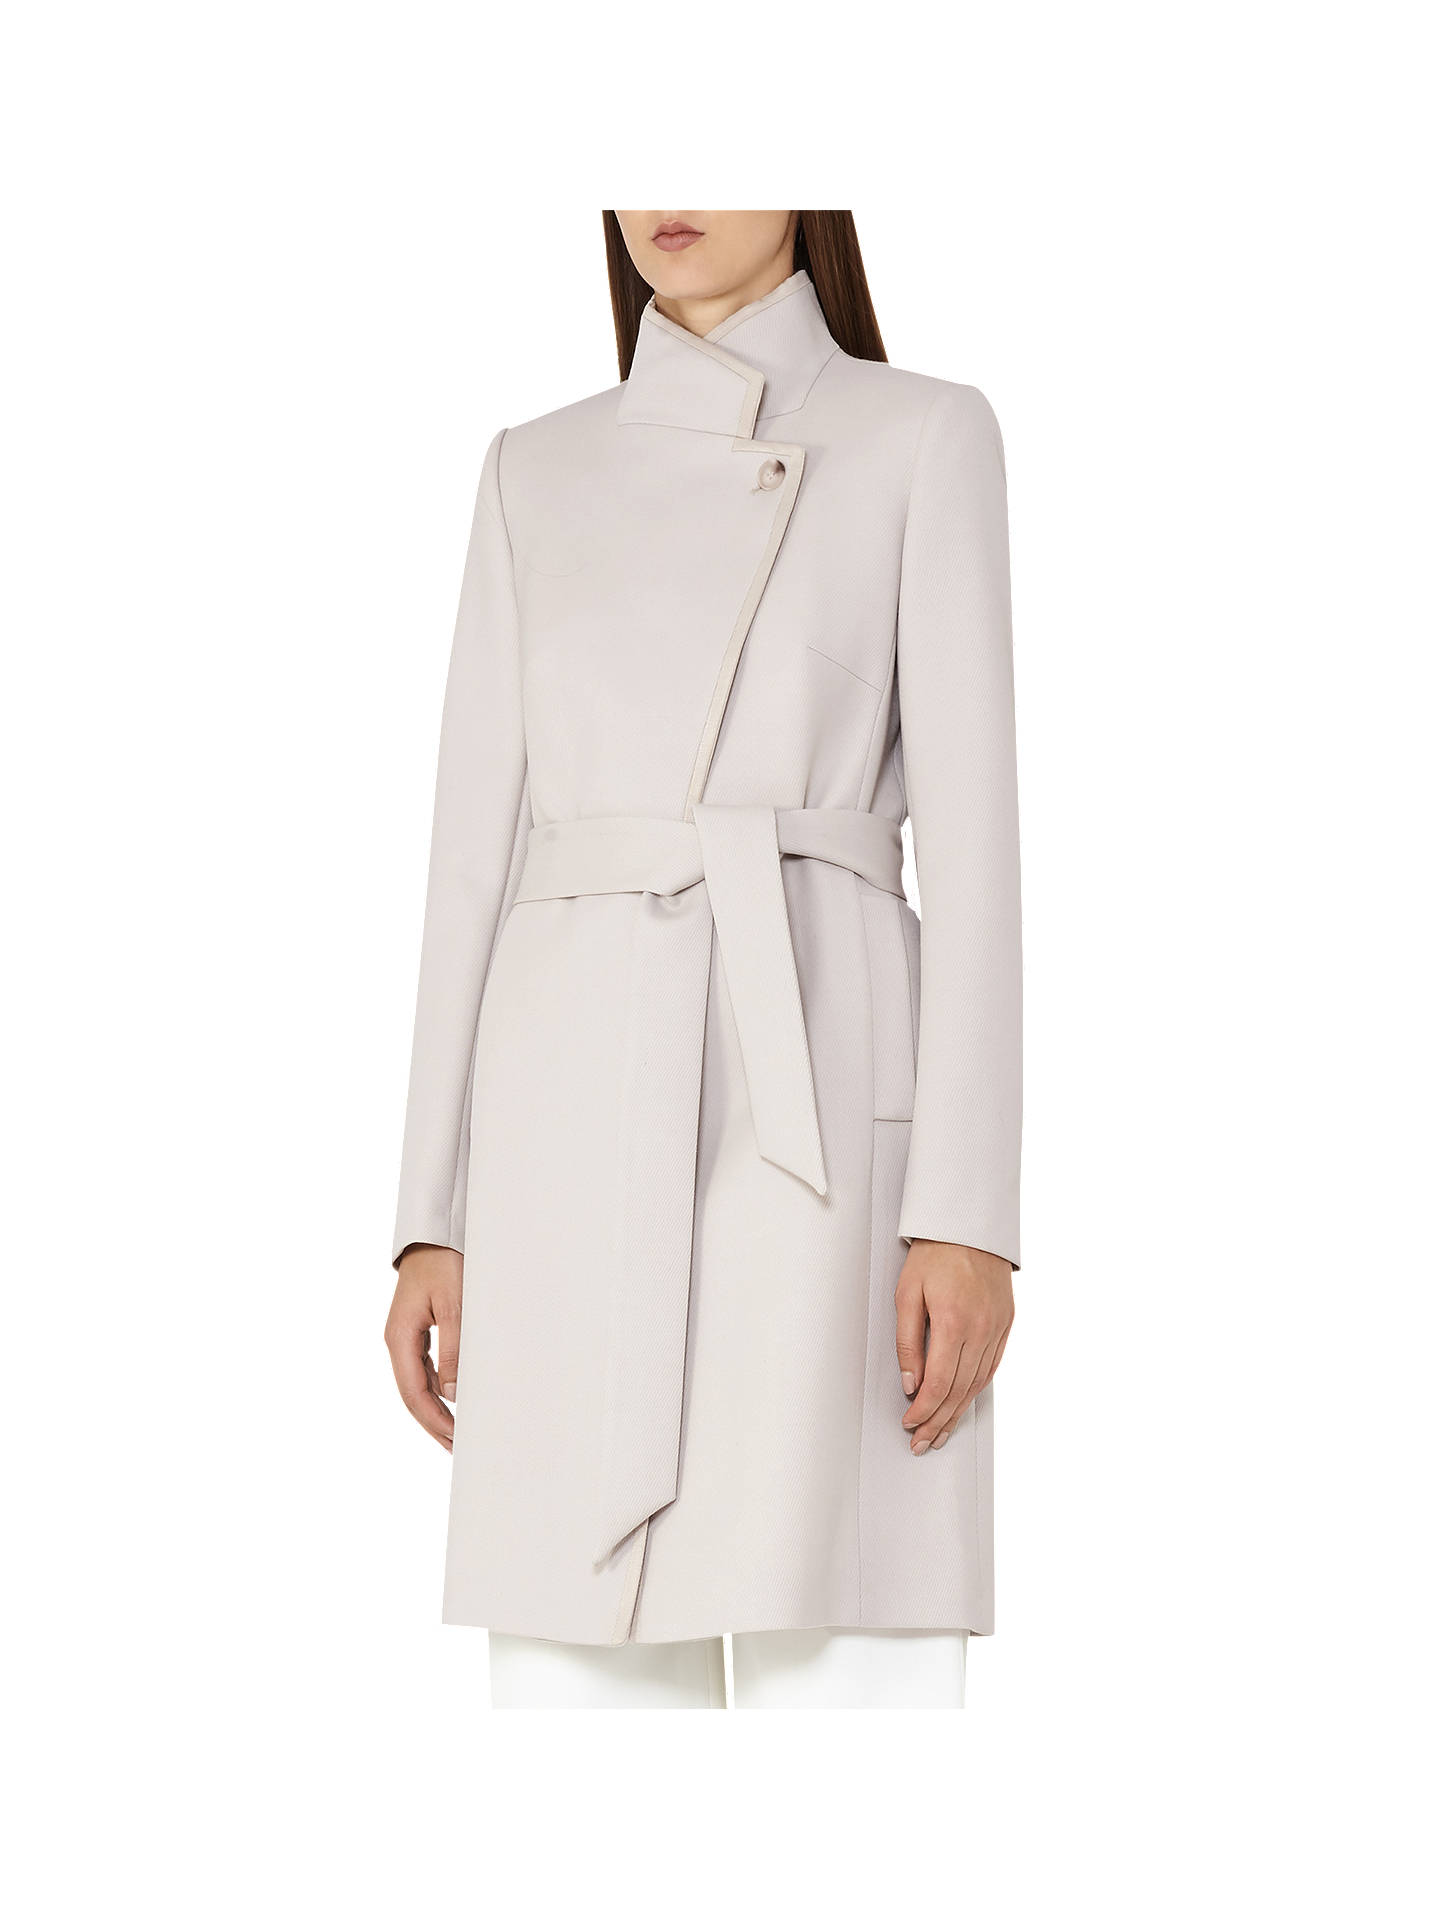 70142057 Reiss Hetty Belted Wrap Front Coat, Tiramisu at John Lewis & Partners